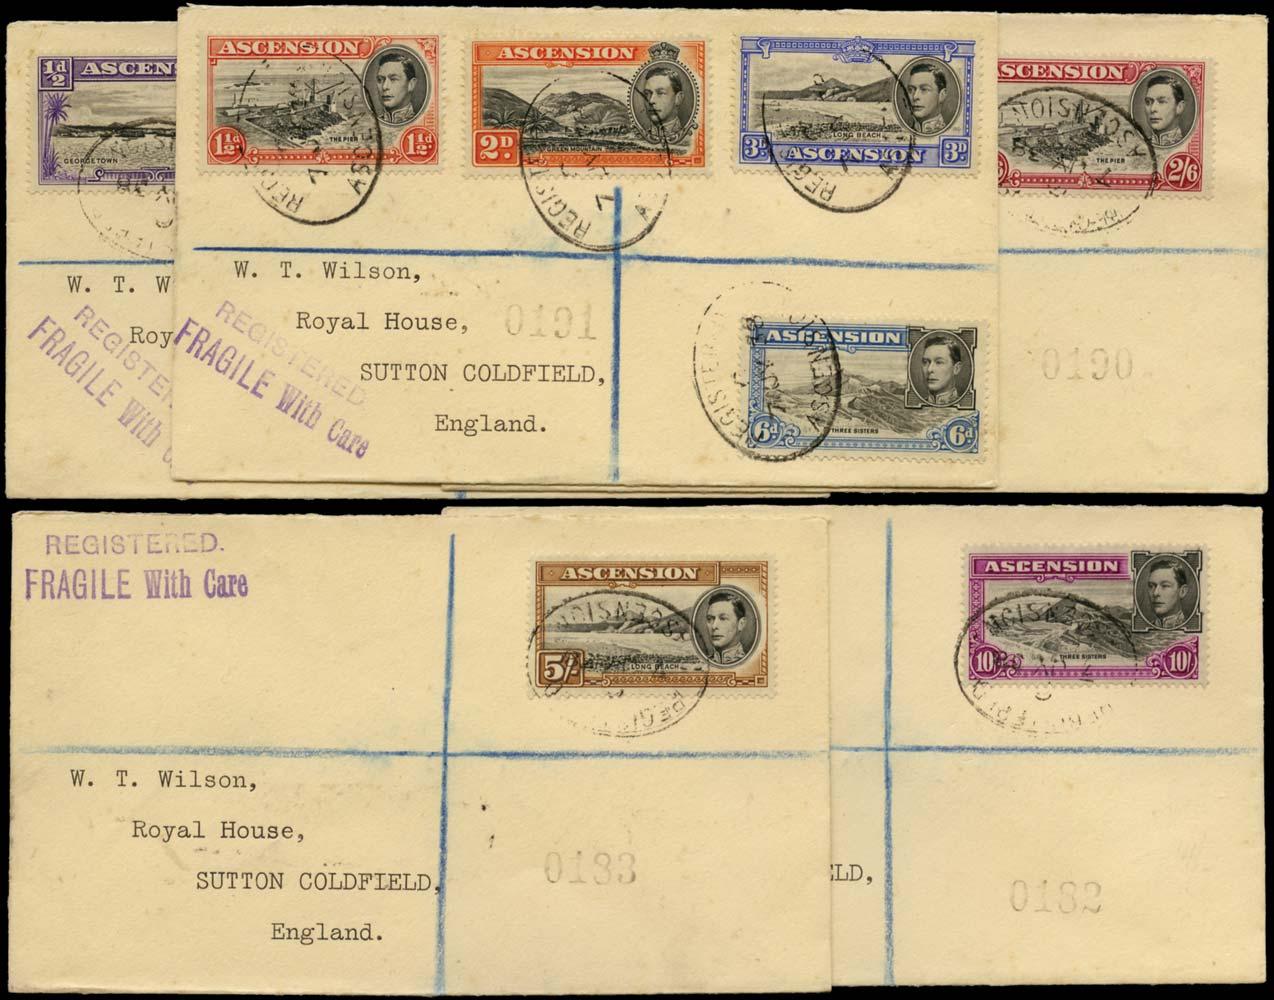 ASCENSION 1938  SG38/47 Cover original printings to 10s